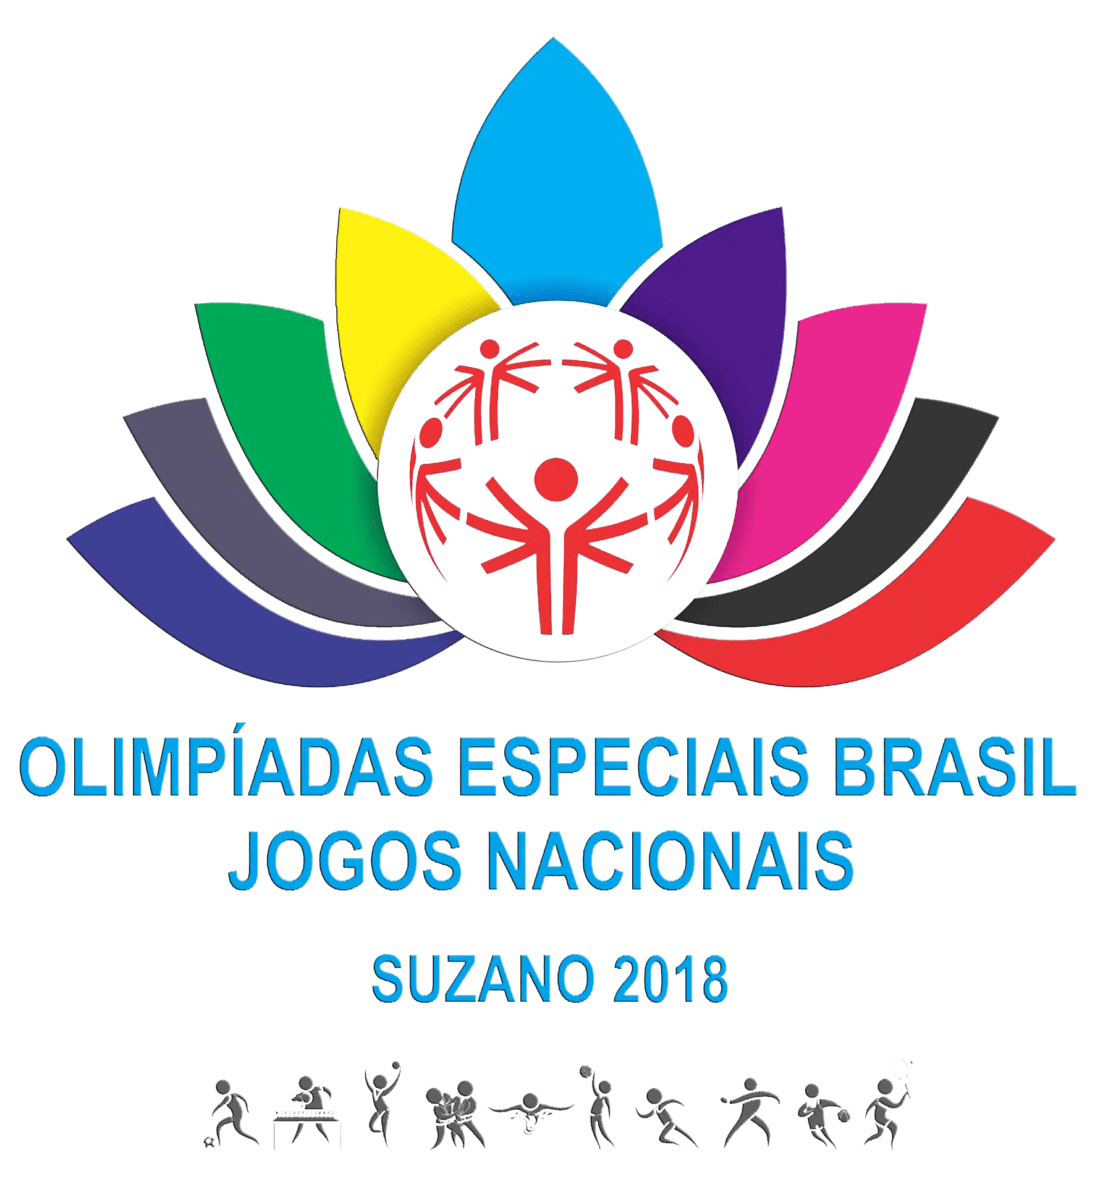 Jogos Nacionais das Olimpíadas Especiais Brasil – Suzano / SP – 2018